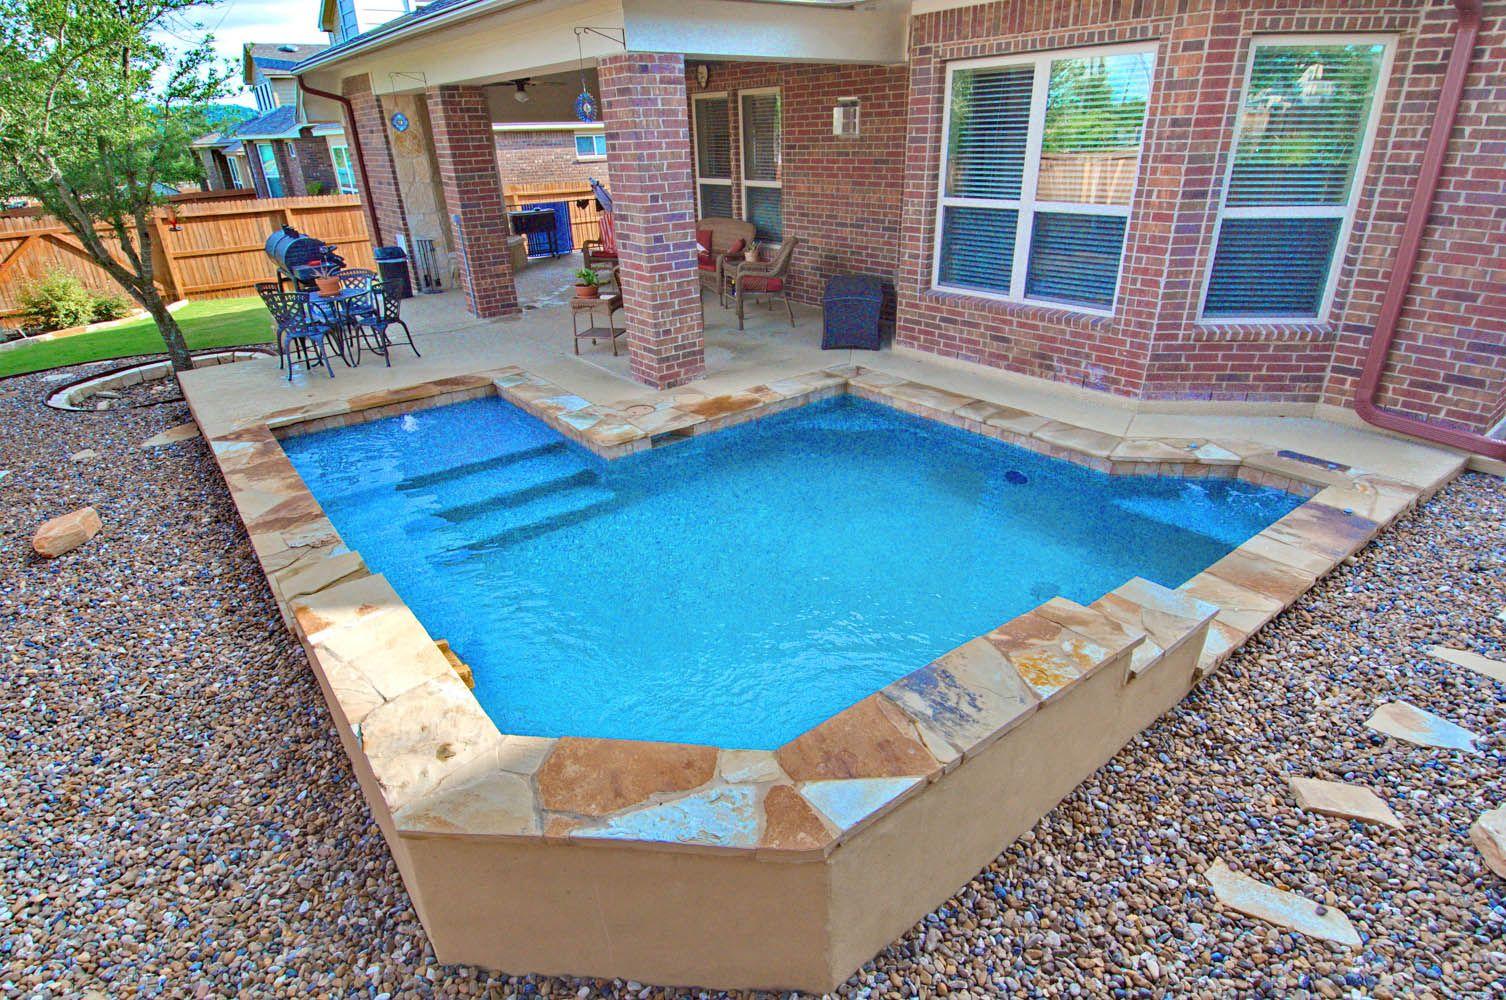 small pool spool screened hot tub pinterest schwimmb der g rten und h uschen. Black Bedroom Furniture Sets. Home Design Ideas